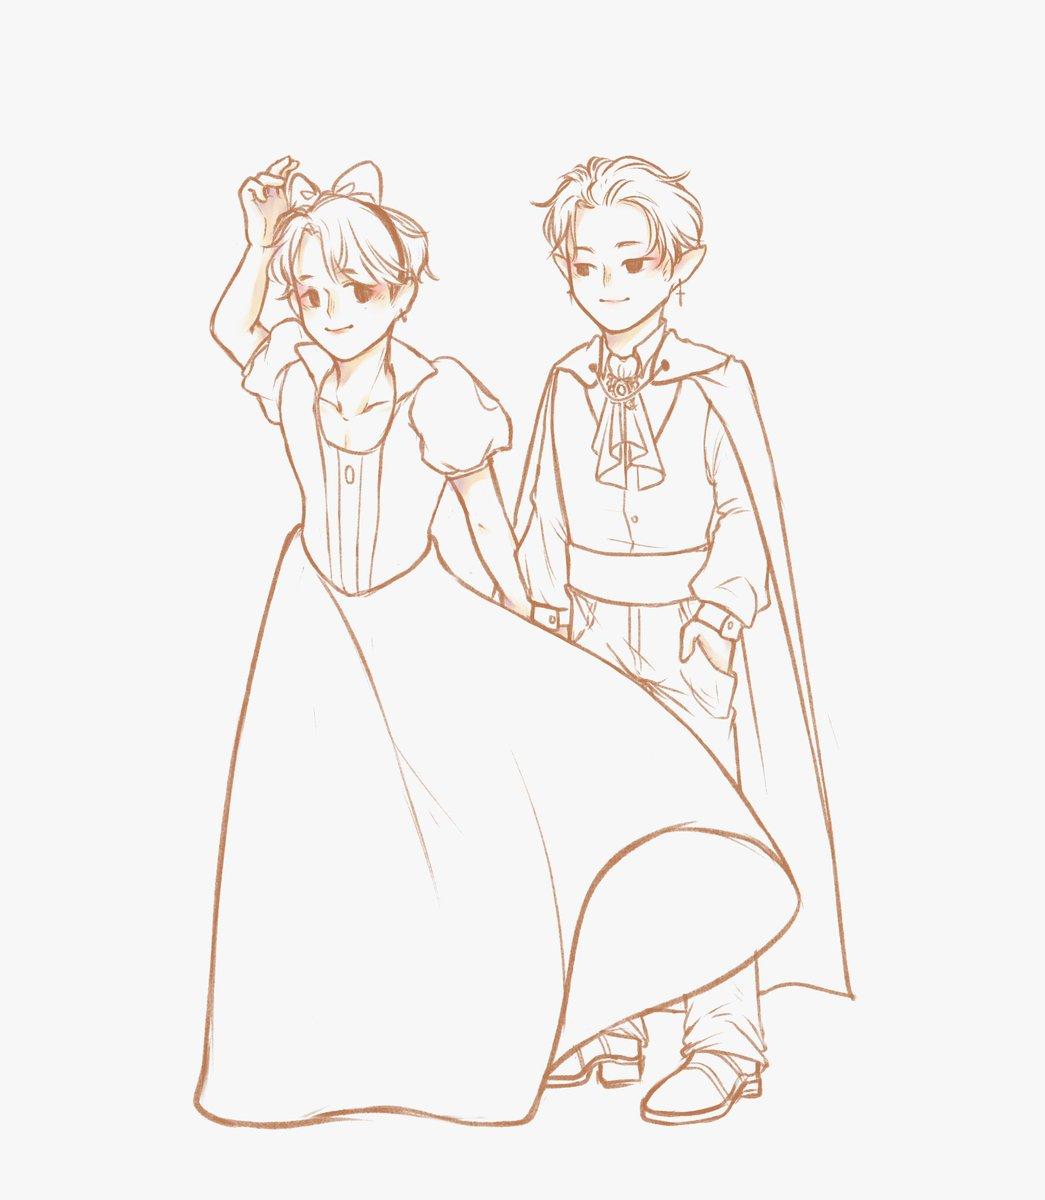 #wip fanart of snow white!dongju and vampire prince!geonhak (based off their halloween costumes) 🎃 #ONEUS #원어스 #이도 #시온